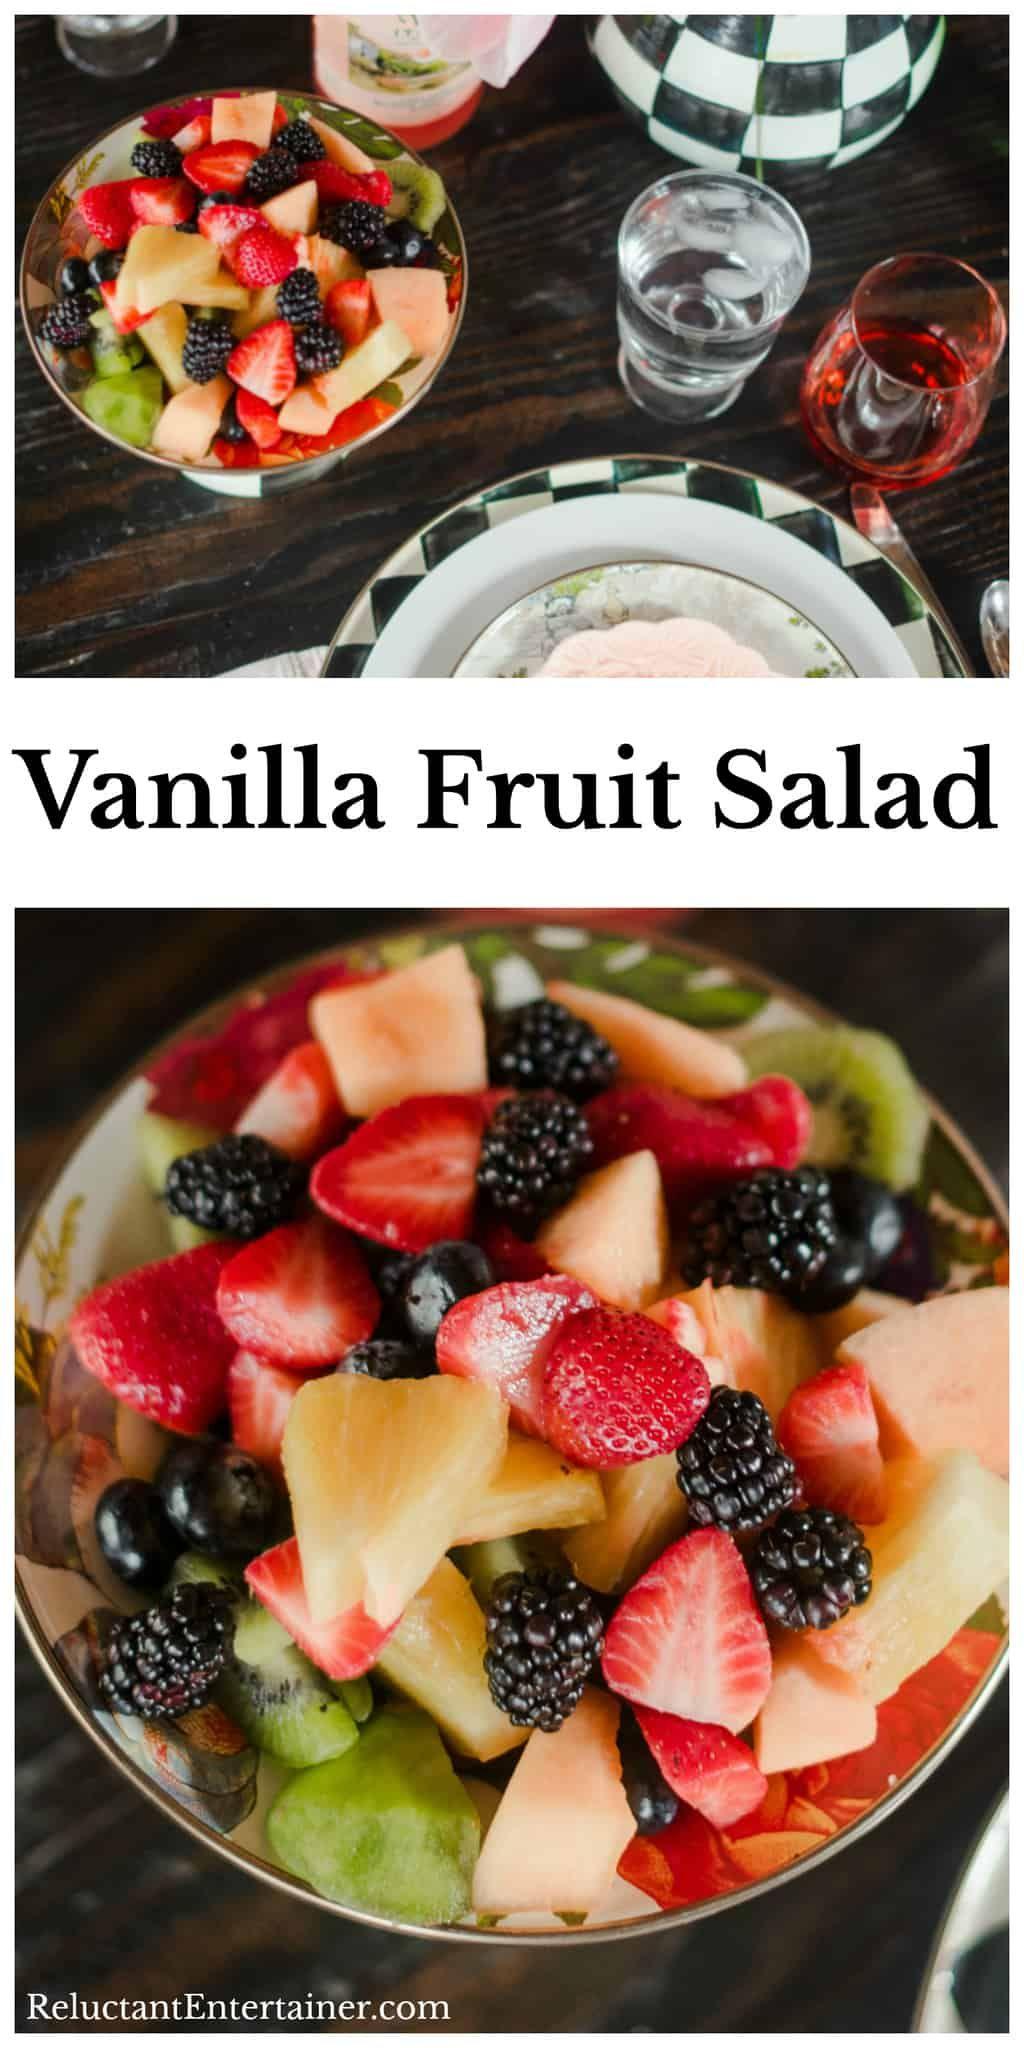 Awe Inspiring Easter Buffet With Vanilla Fruit Salad Recipe Fruitsalad Interior Design Ideas Lukepblogthenellocom